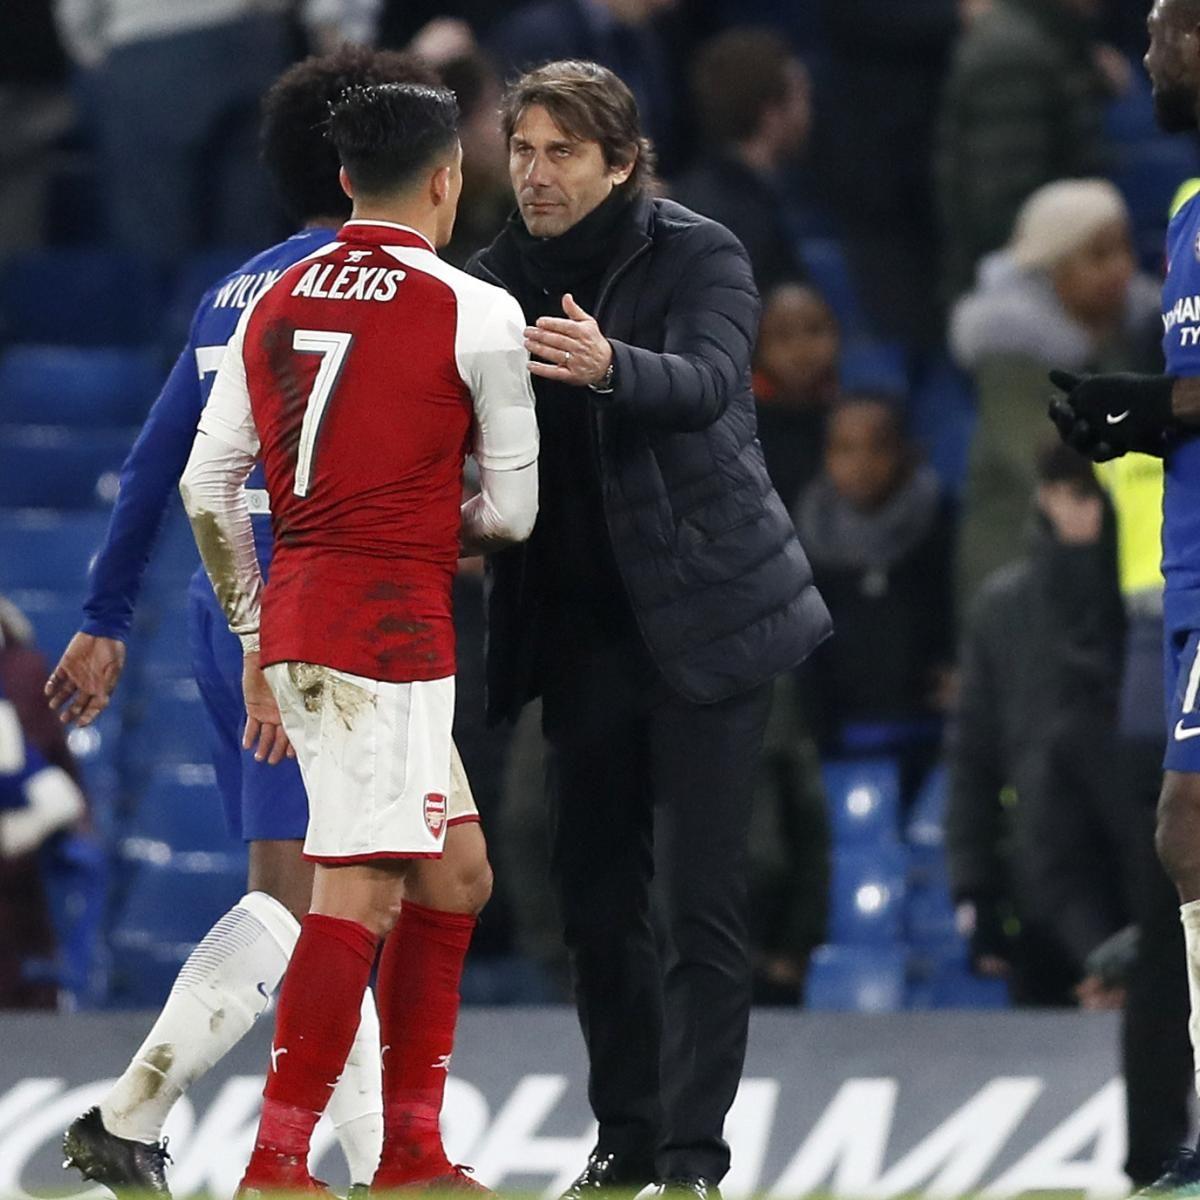 Chelsea Transfer News: Antonio Conte Reportedly Wanted Alexis Sanchez Deal